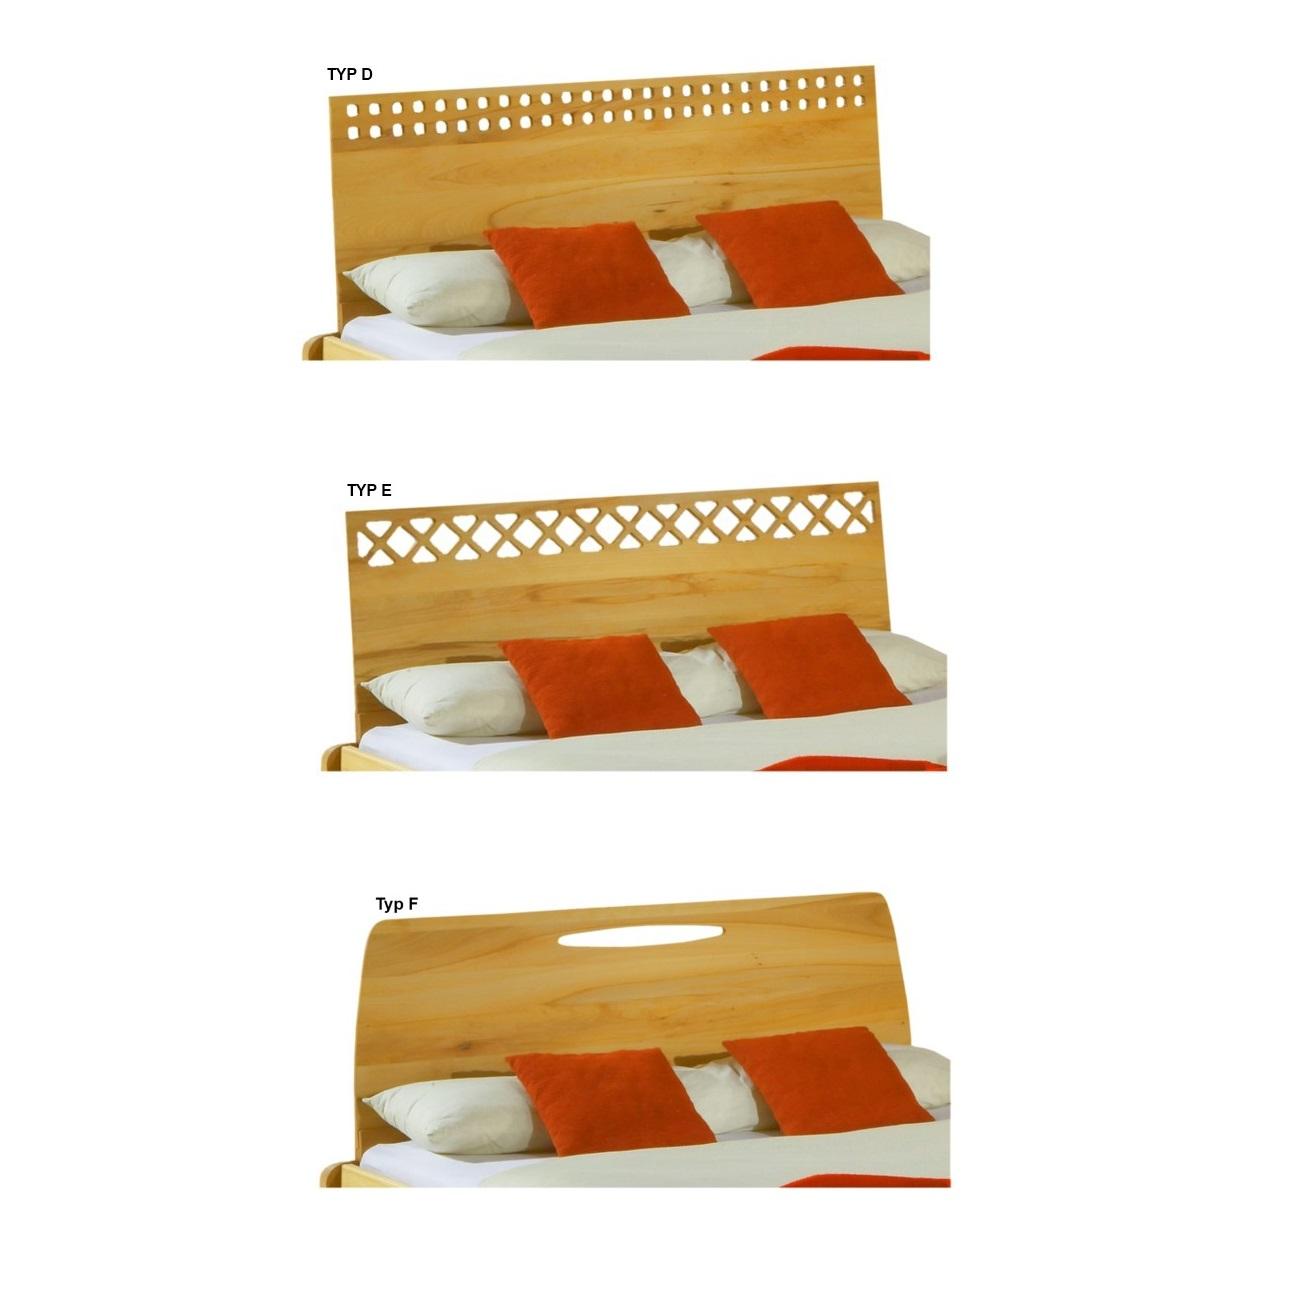 r ckenlehne f r unsere massivholzbetten online sanit tshaus. Black Bedroom Furniture Sets. Home Design Ideas